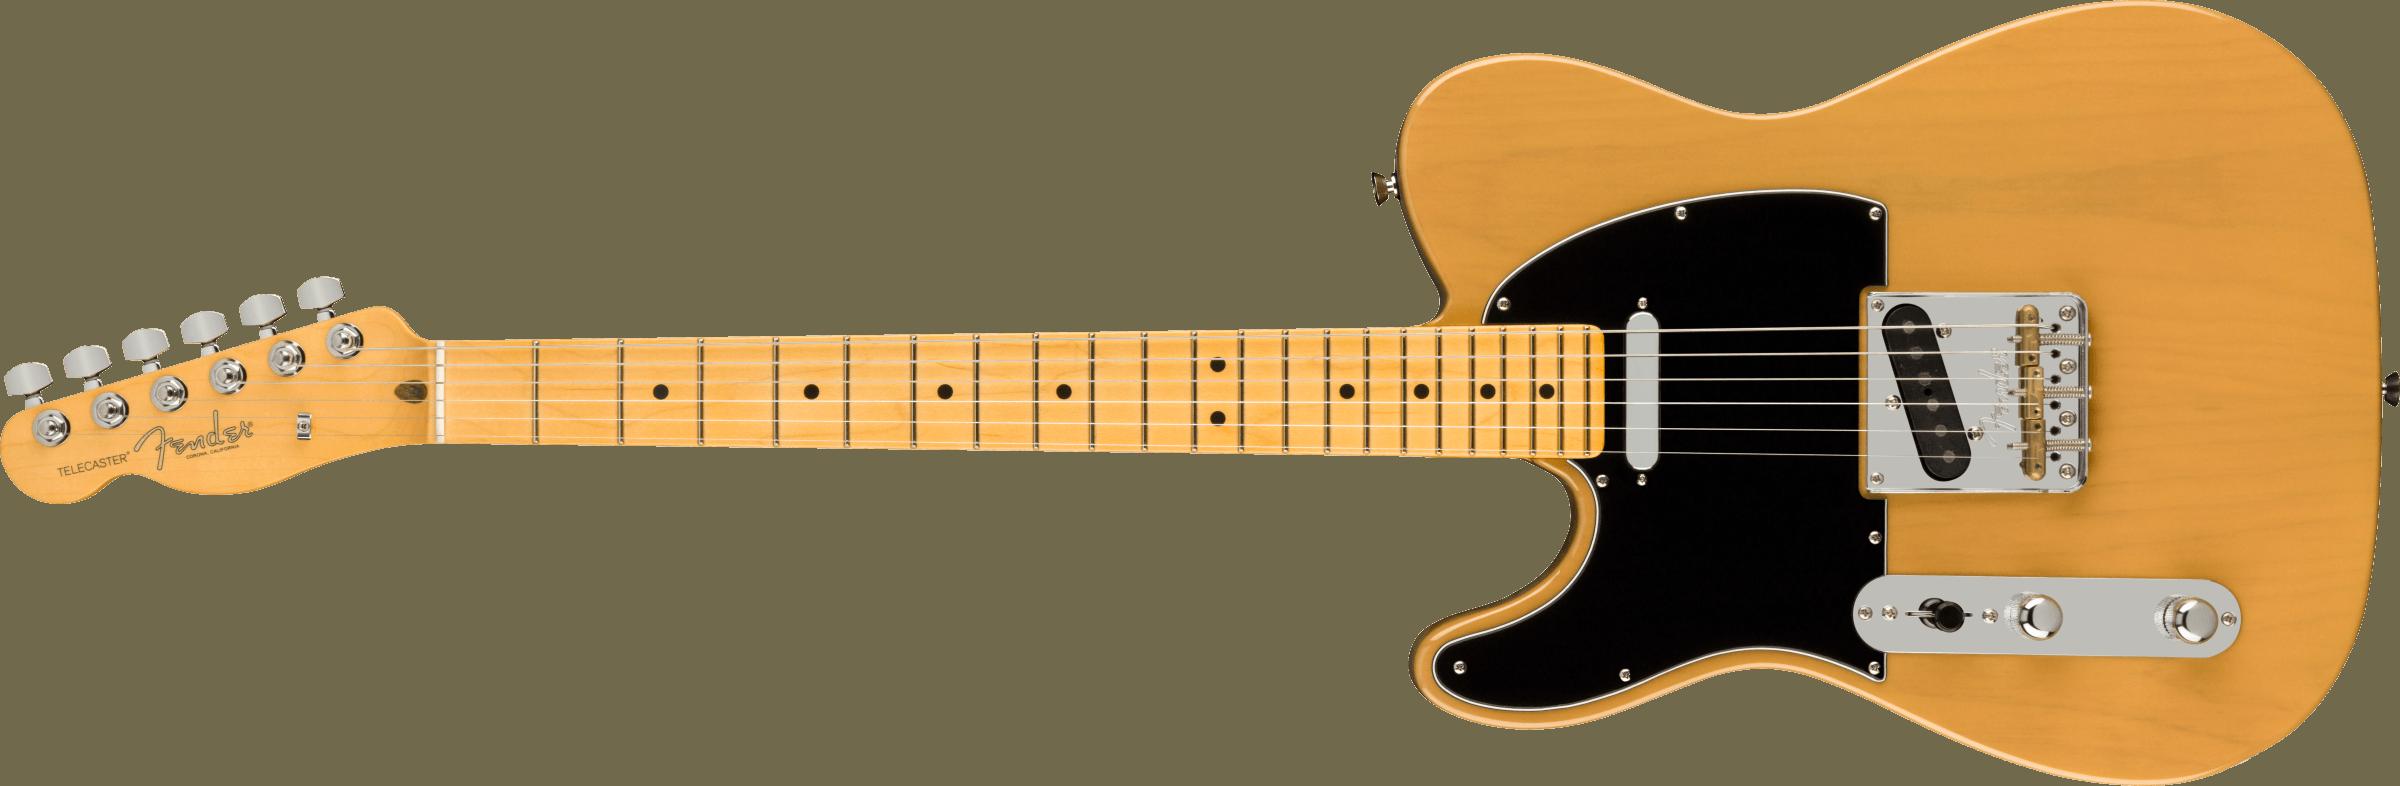 FENDER-American-Professional-II-Telecaster-Left-Hand-Maple-Fingerboard-Butterscotch-Blonde-sku-571005276